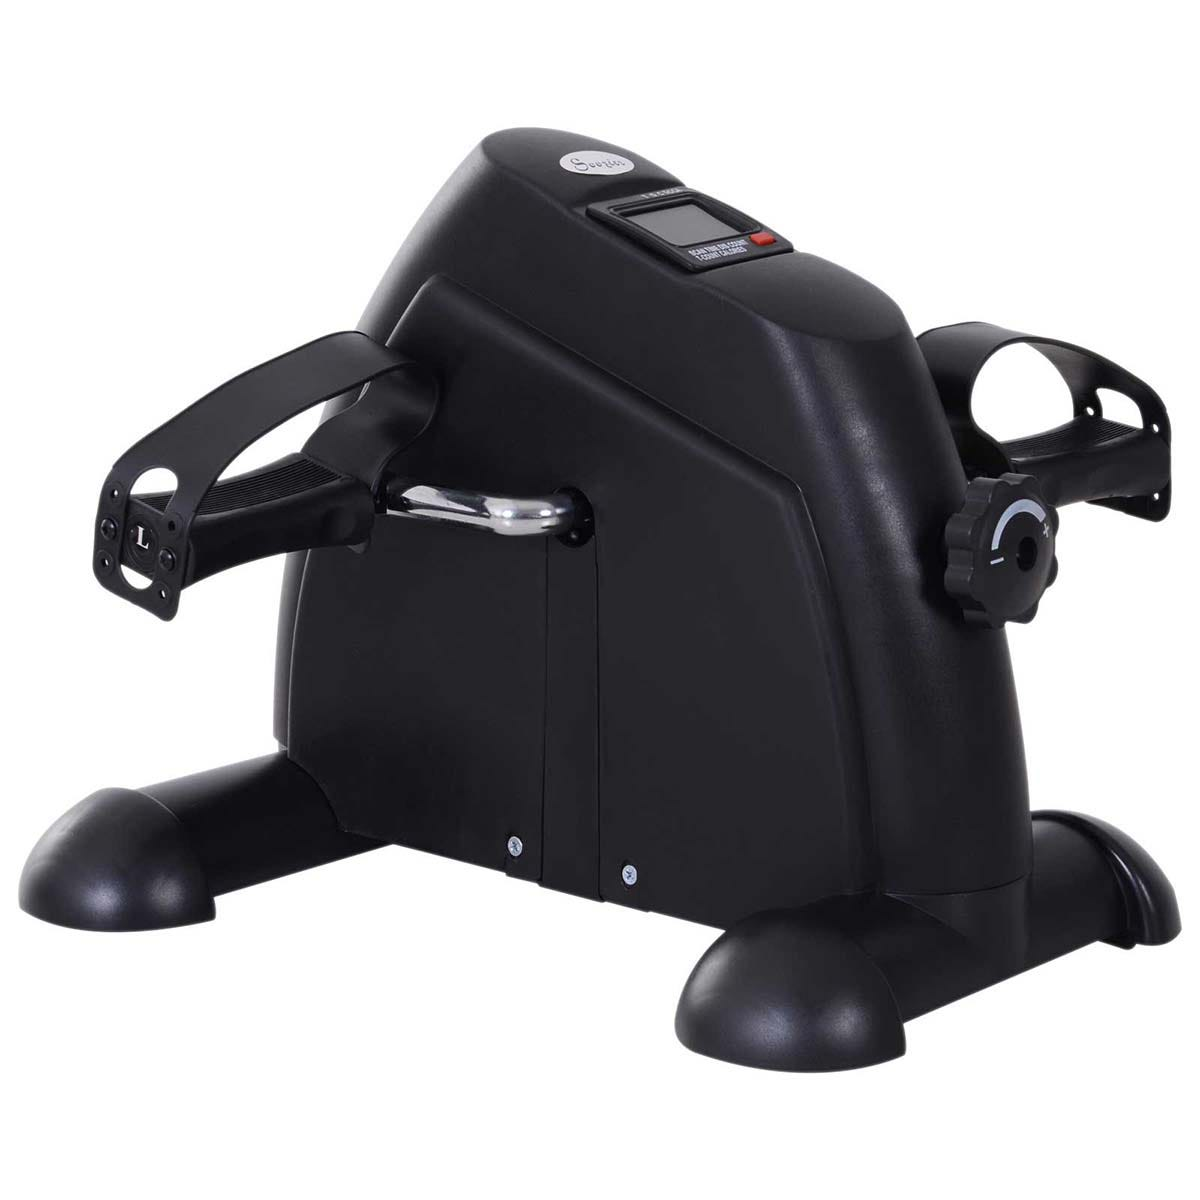 HOMCOM Mini Exercise Bike Portable Pedal Manual Machine Indoor Fitness Black